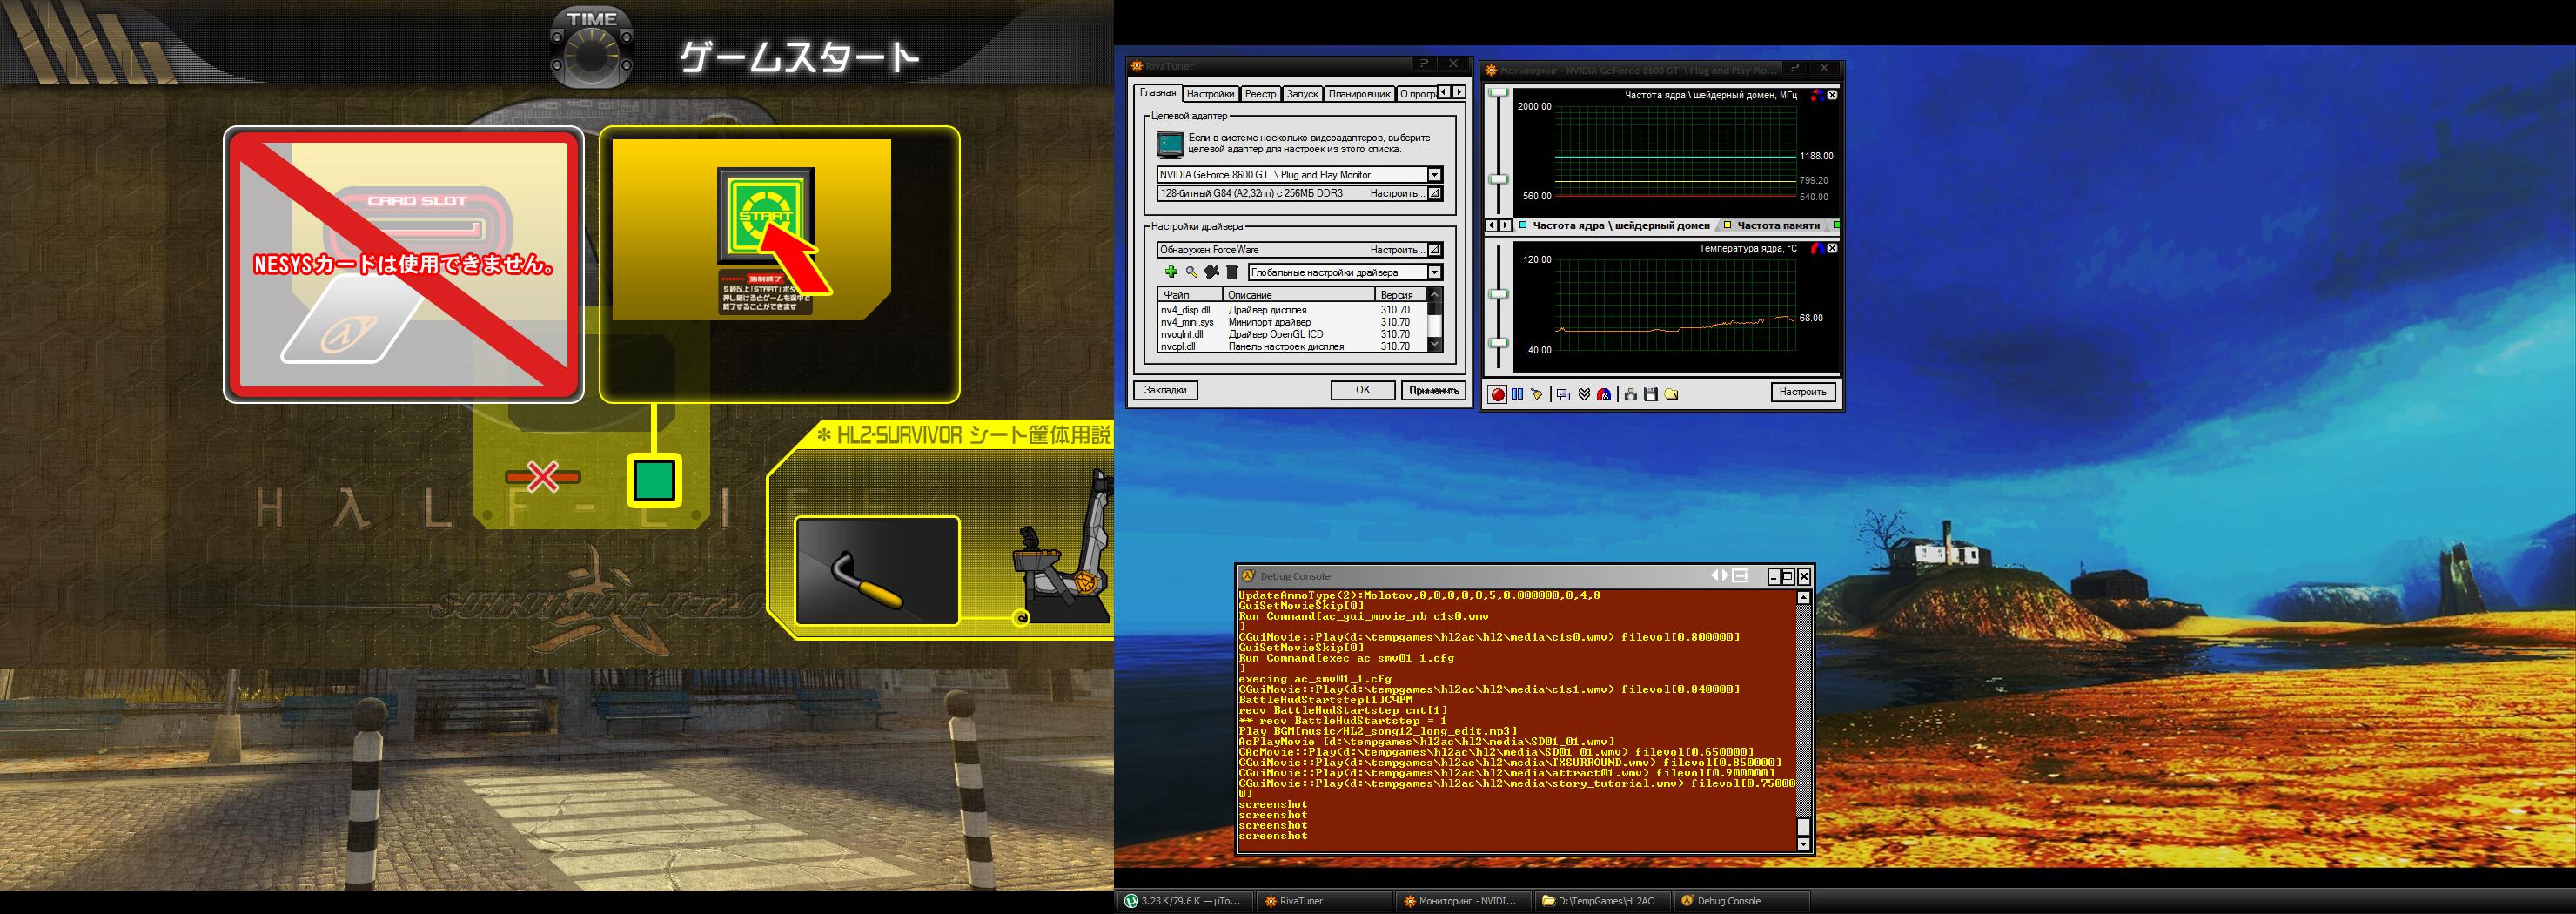 back01_F1.png - Half-Life 2 Half-Life 2 Survivor, HL2Survivor